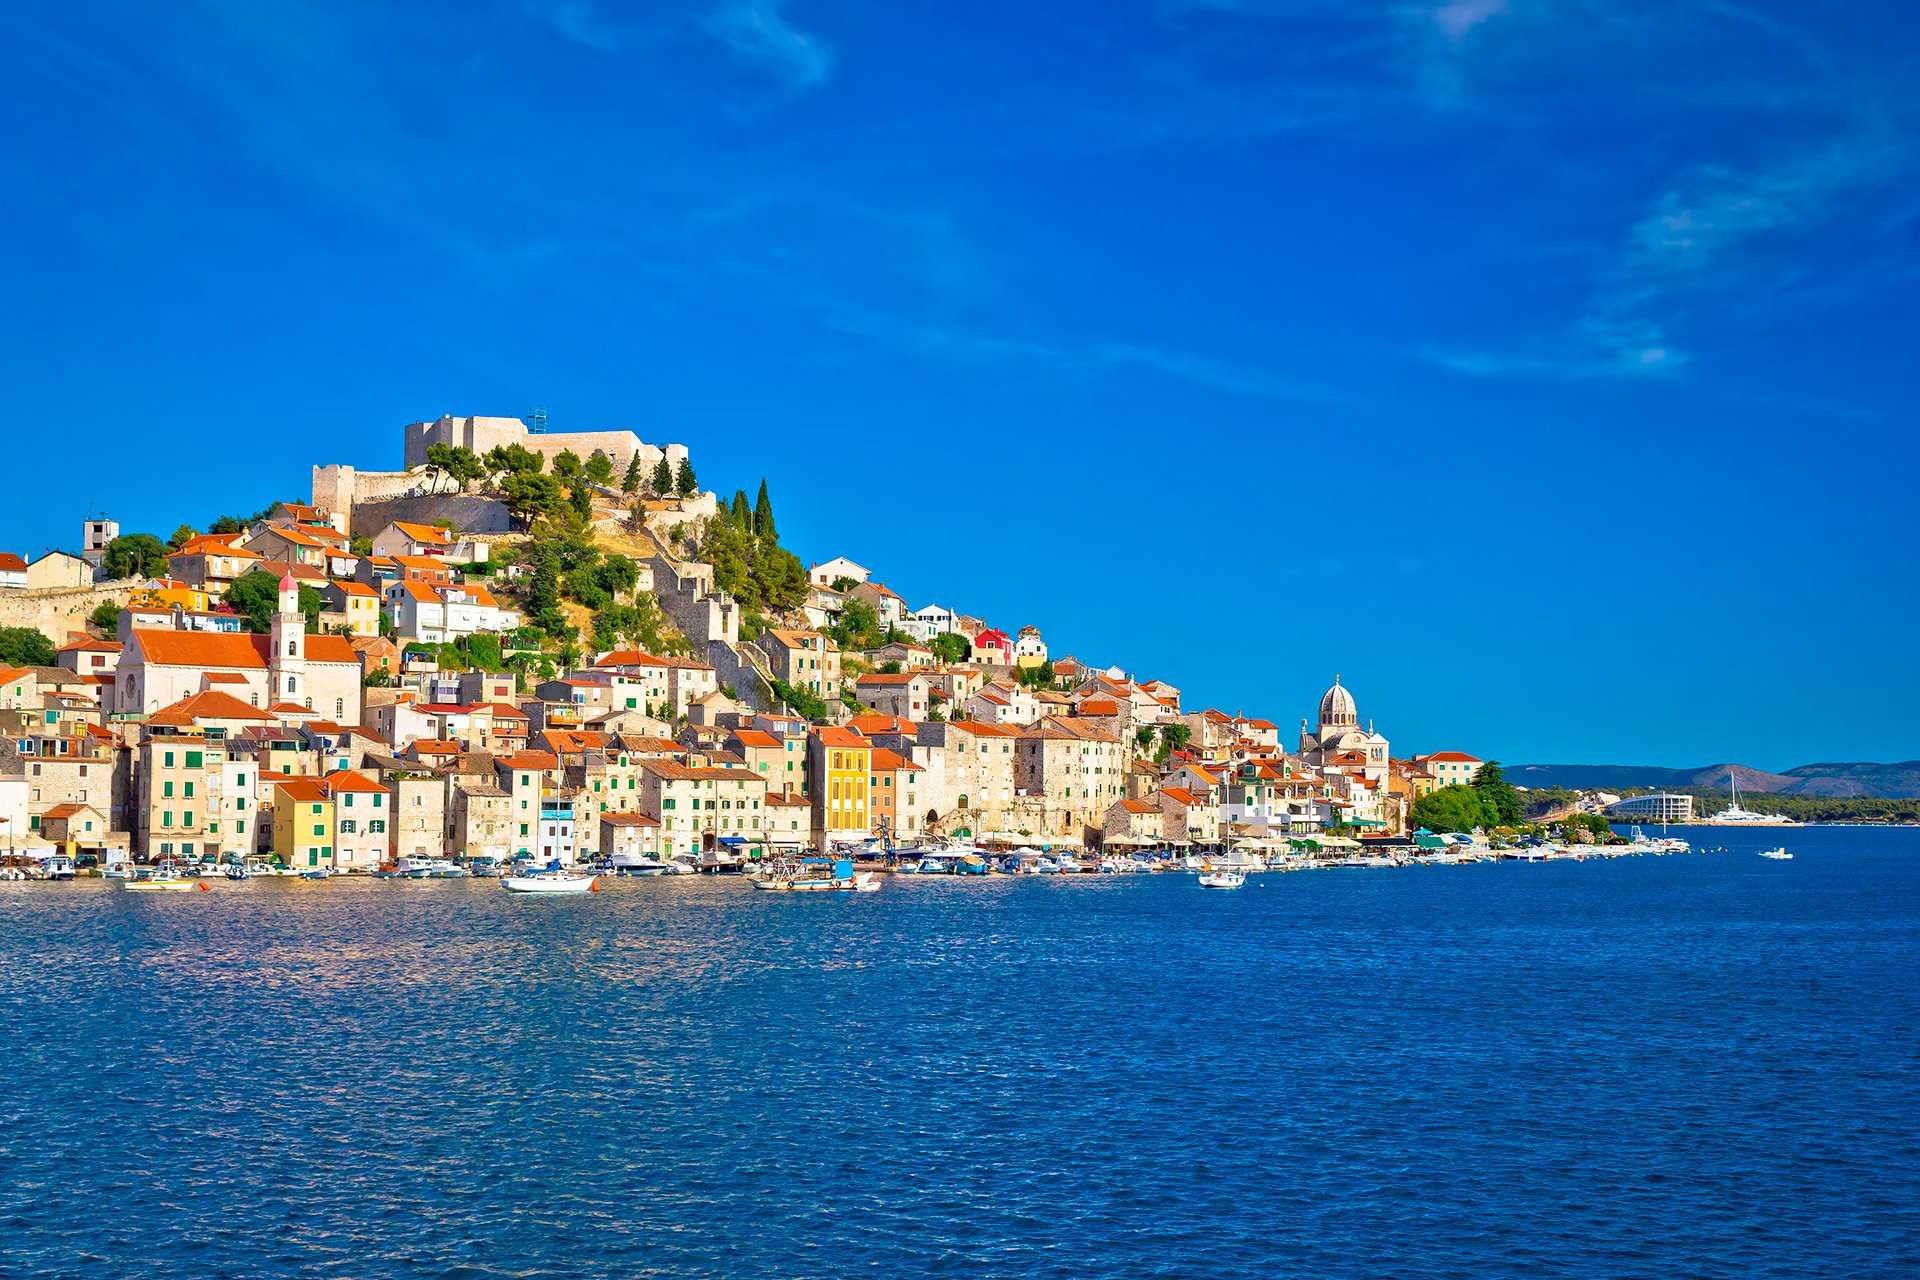 отдых в августе на острове Шибеник - Хорватия